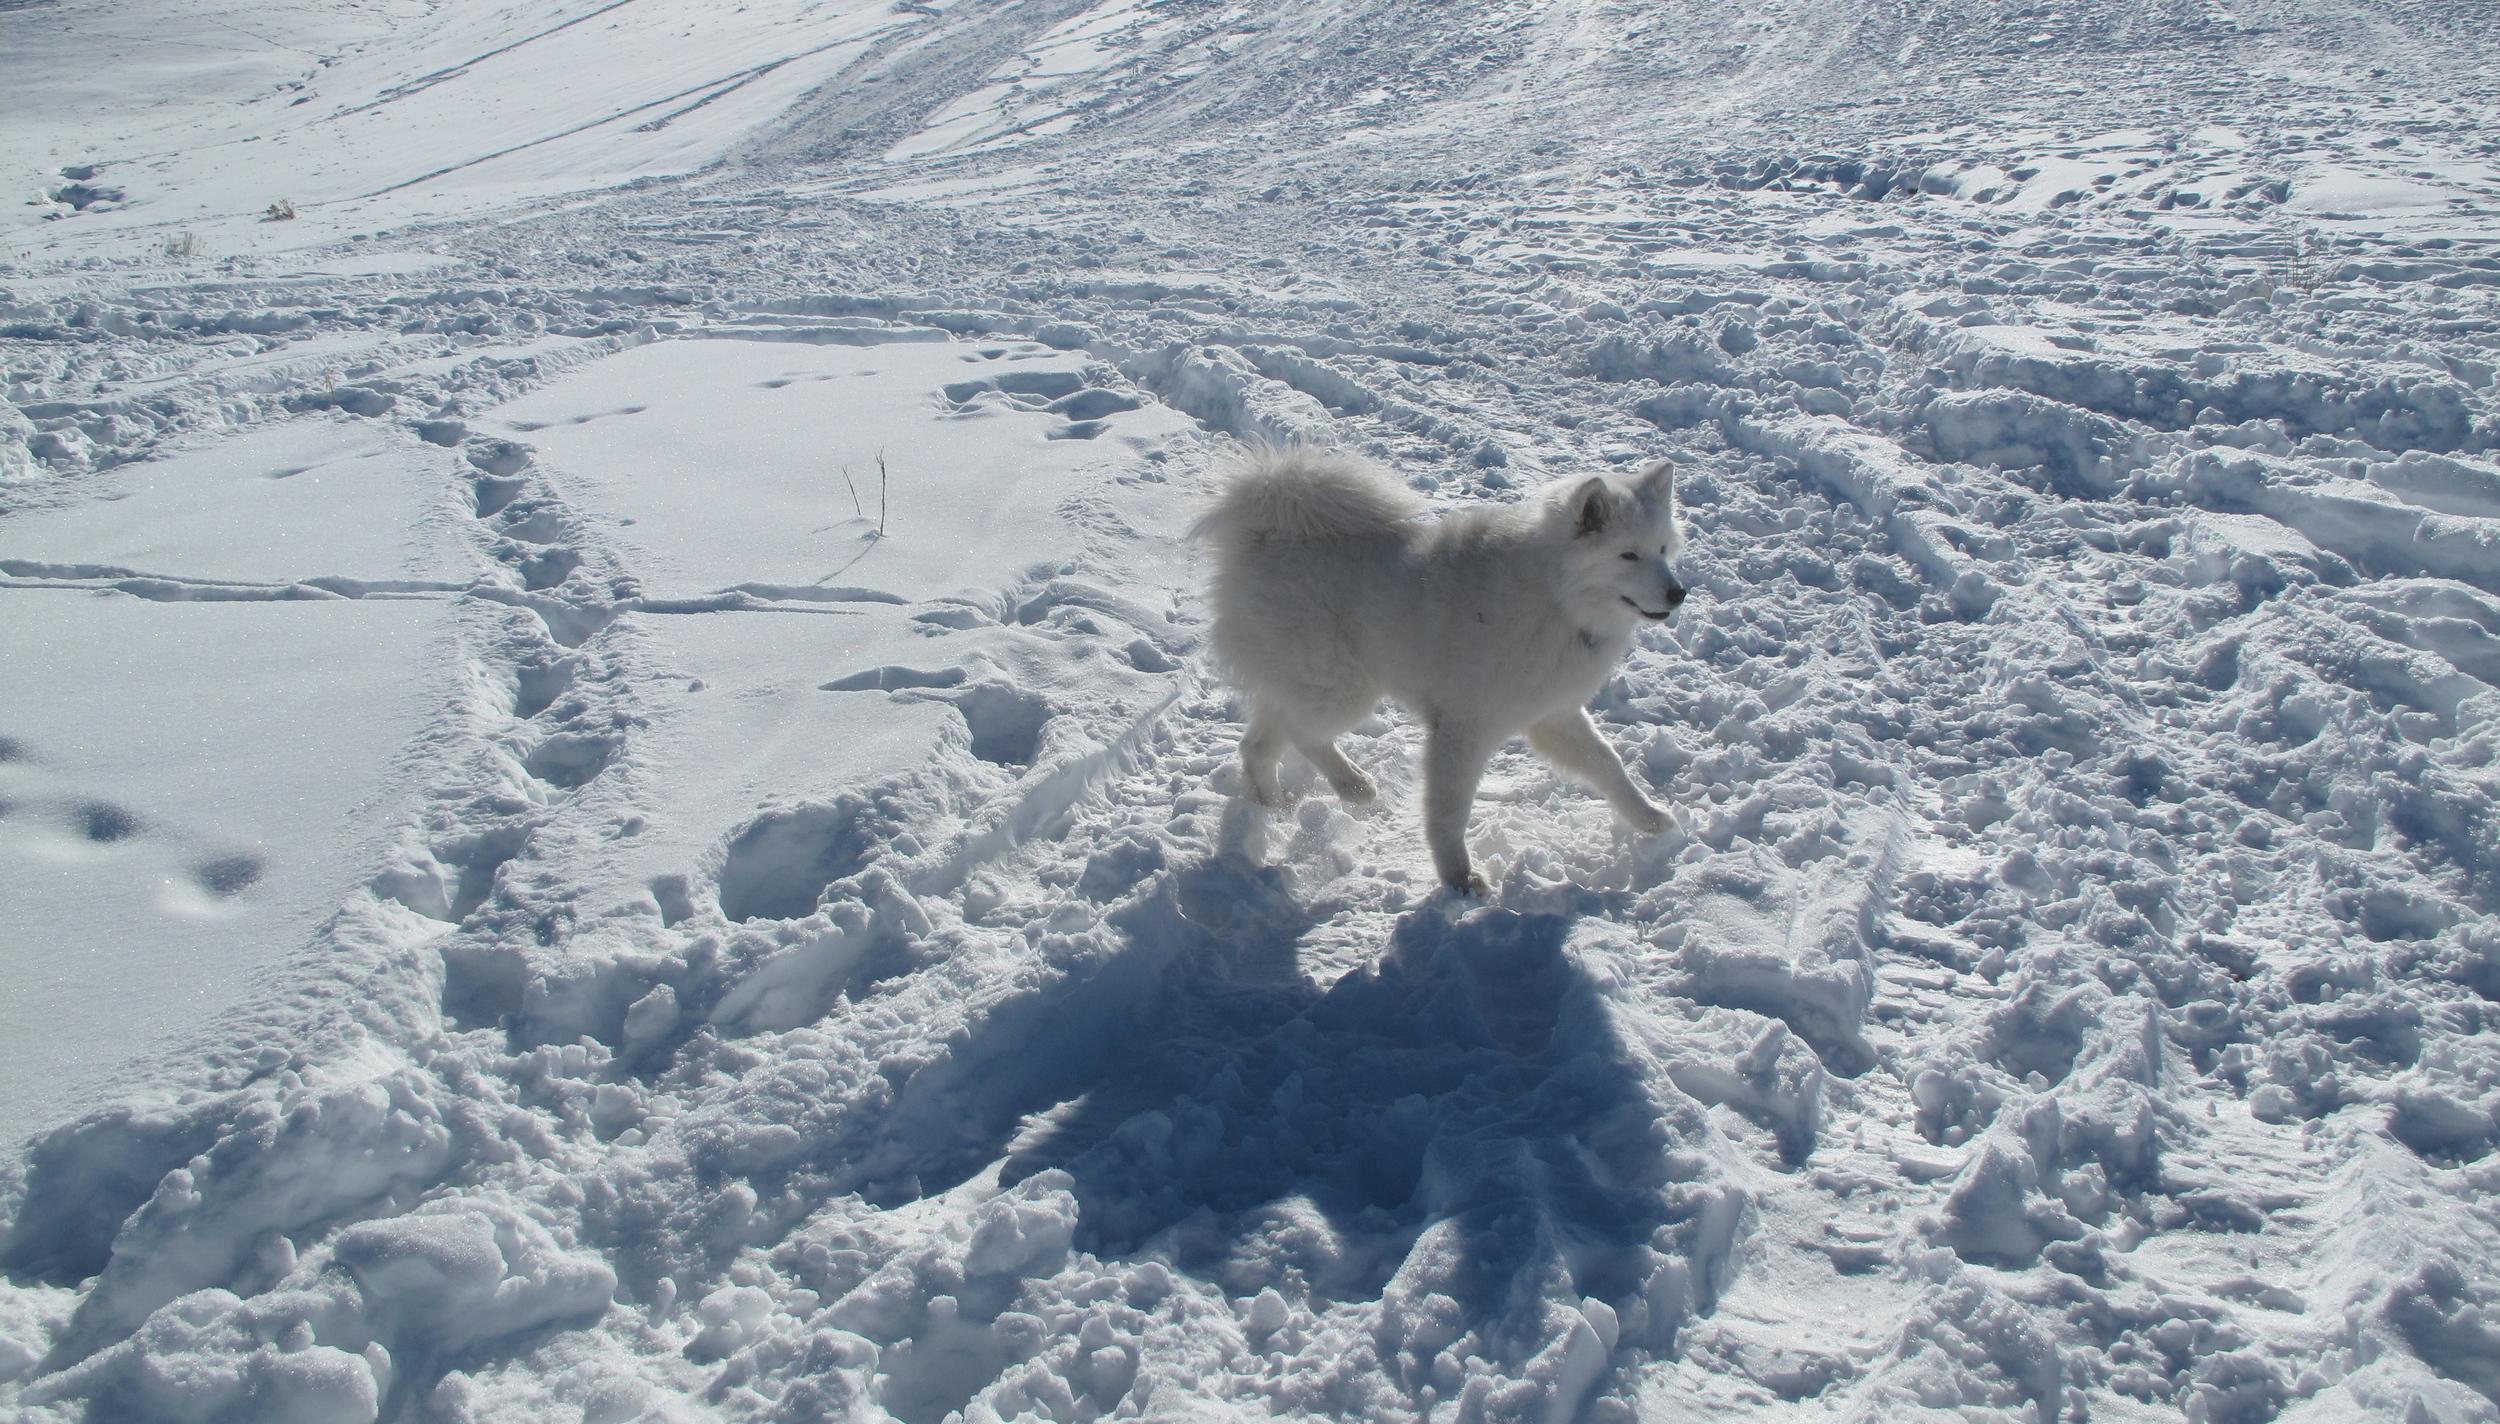 Fluffy white Samoyed dog in the snow